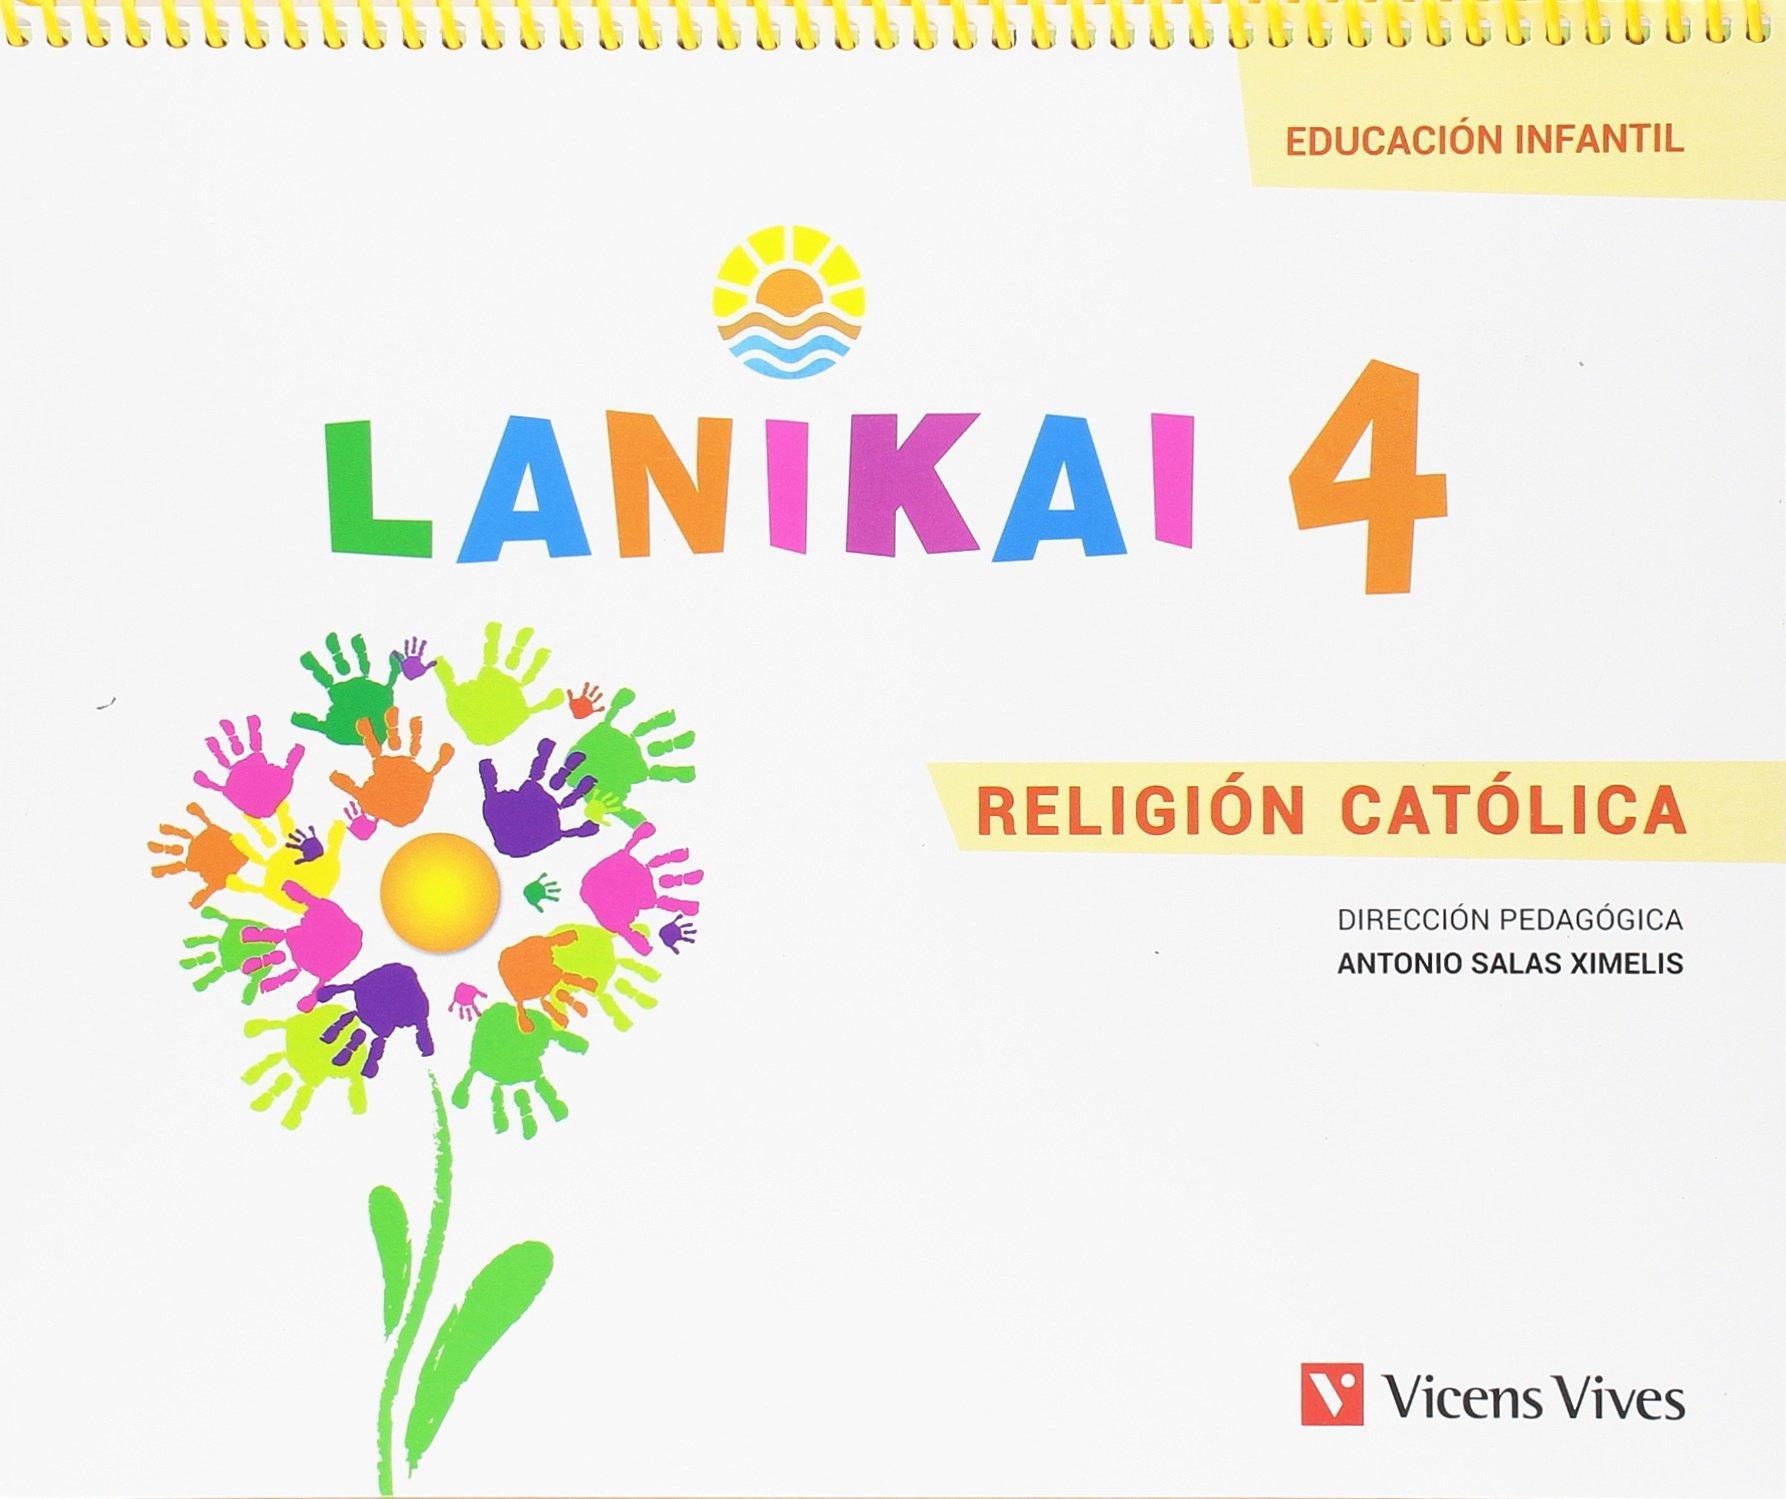 LIBRO DE TEXTO - 2 INFANTIL LANIKAI. 4 AÑOS. RELIGIÓN CATÓLICA